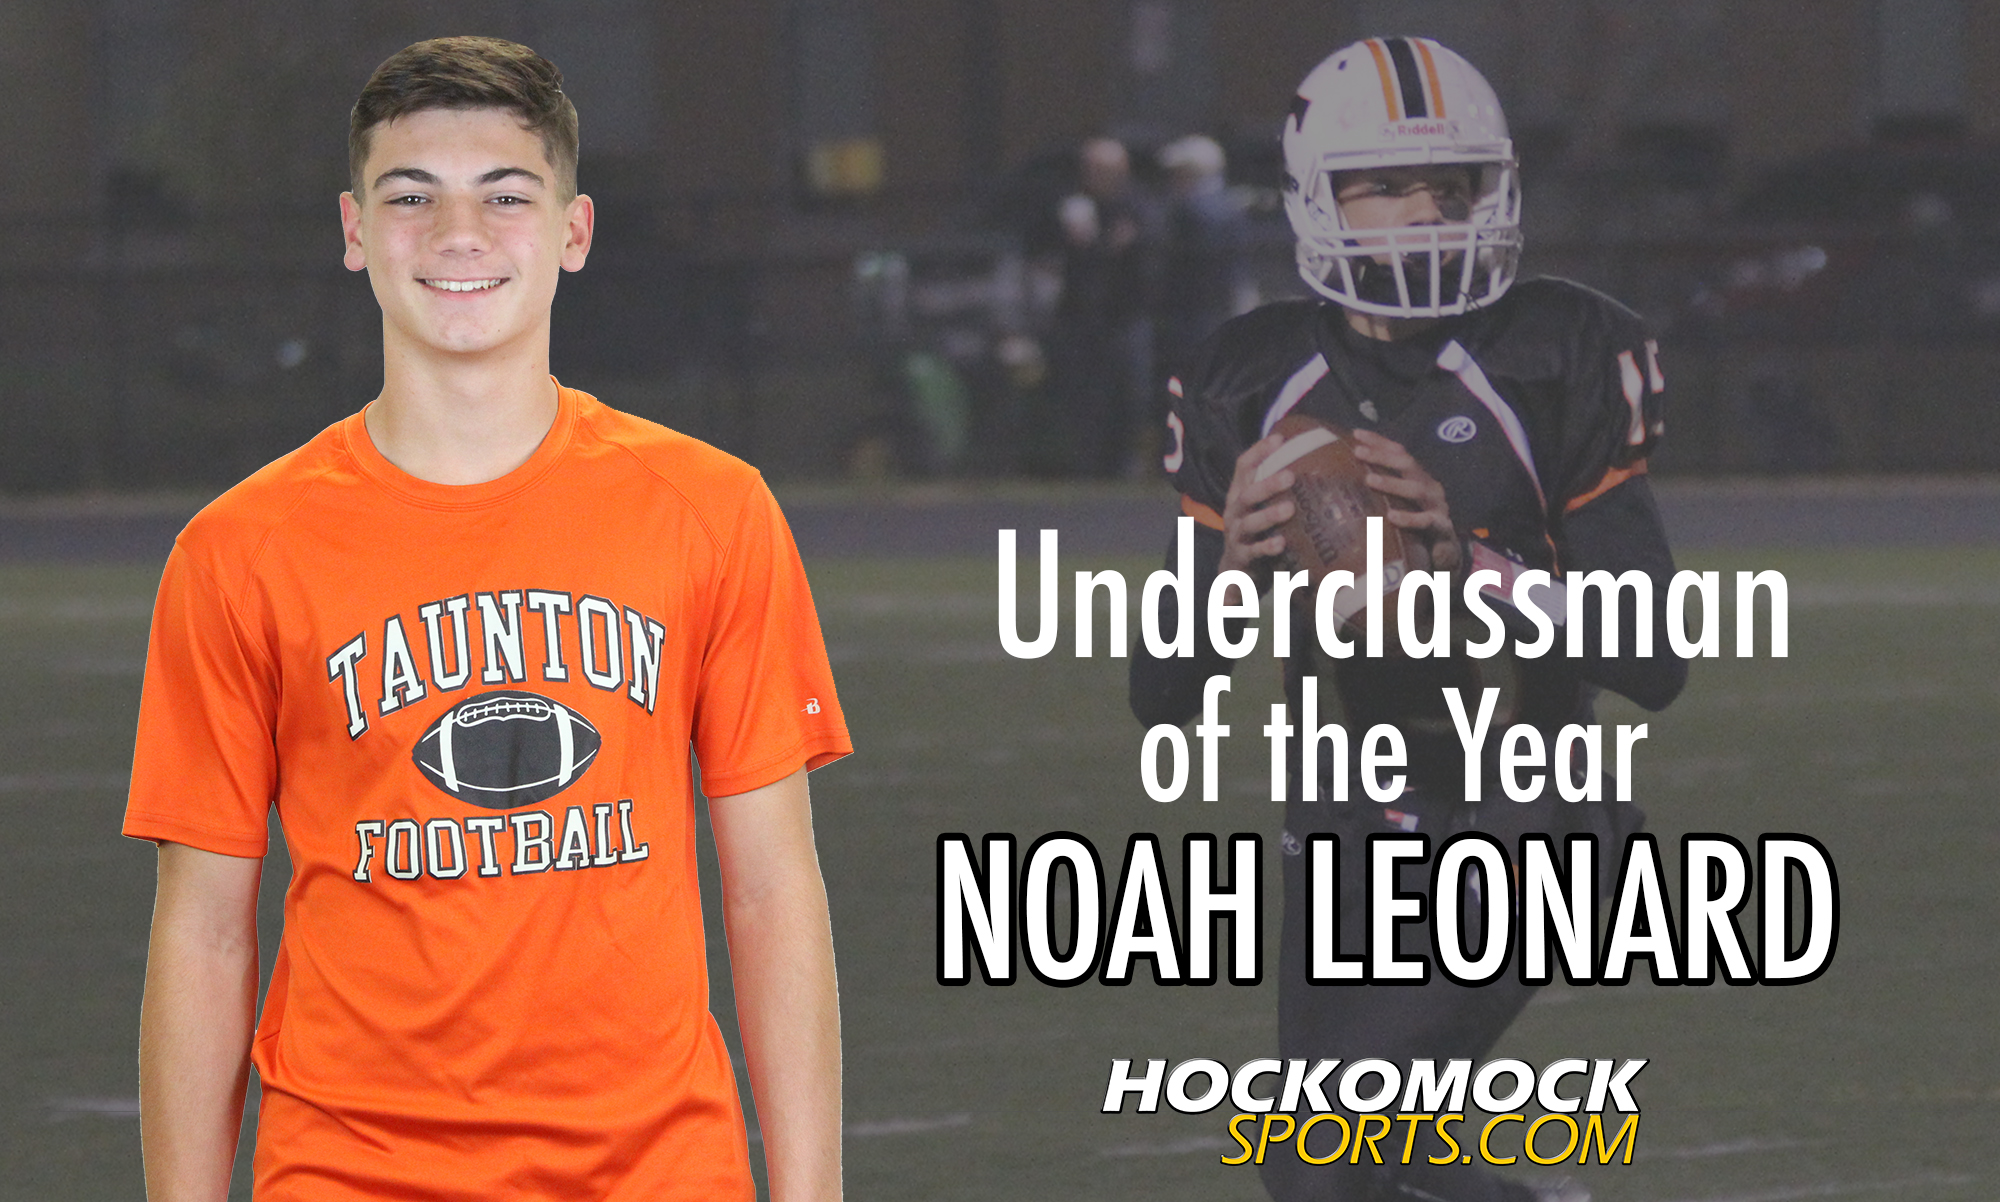 Noah Leonard